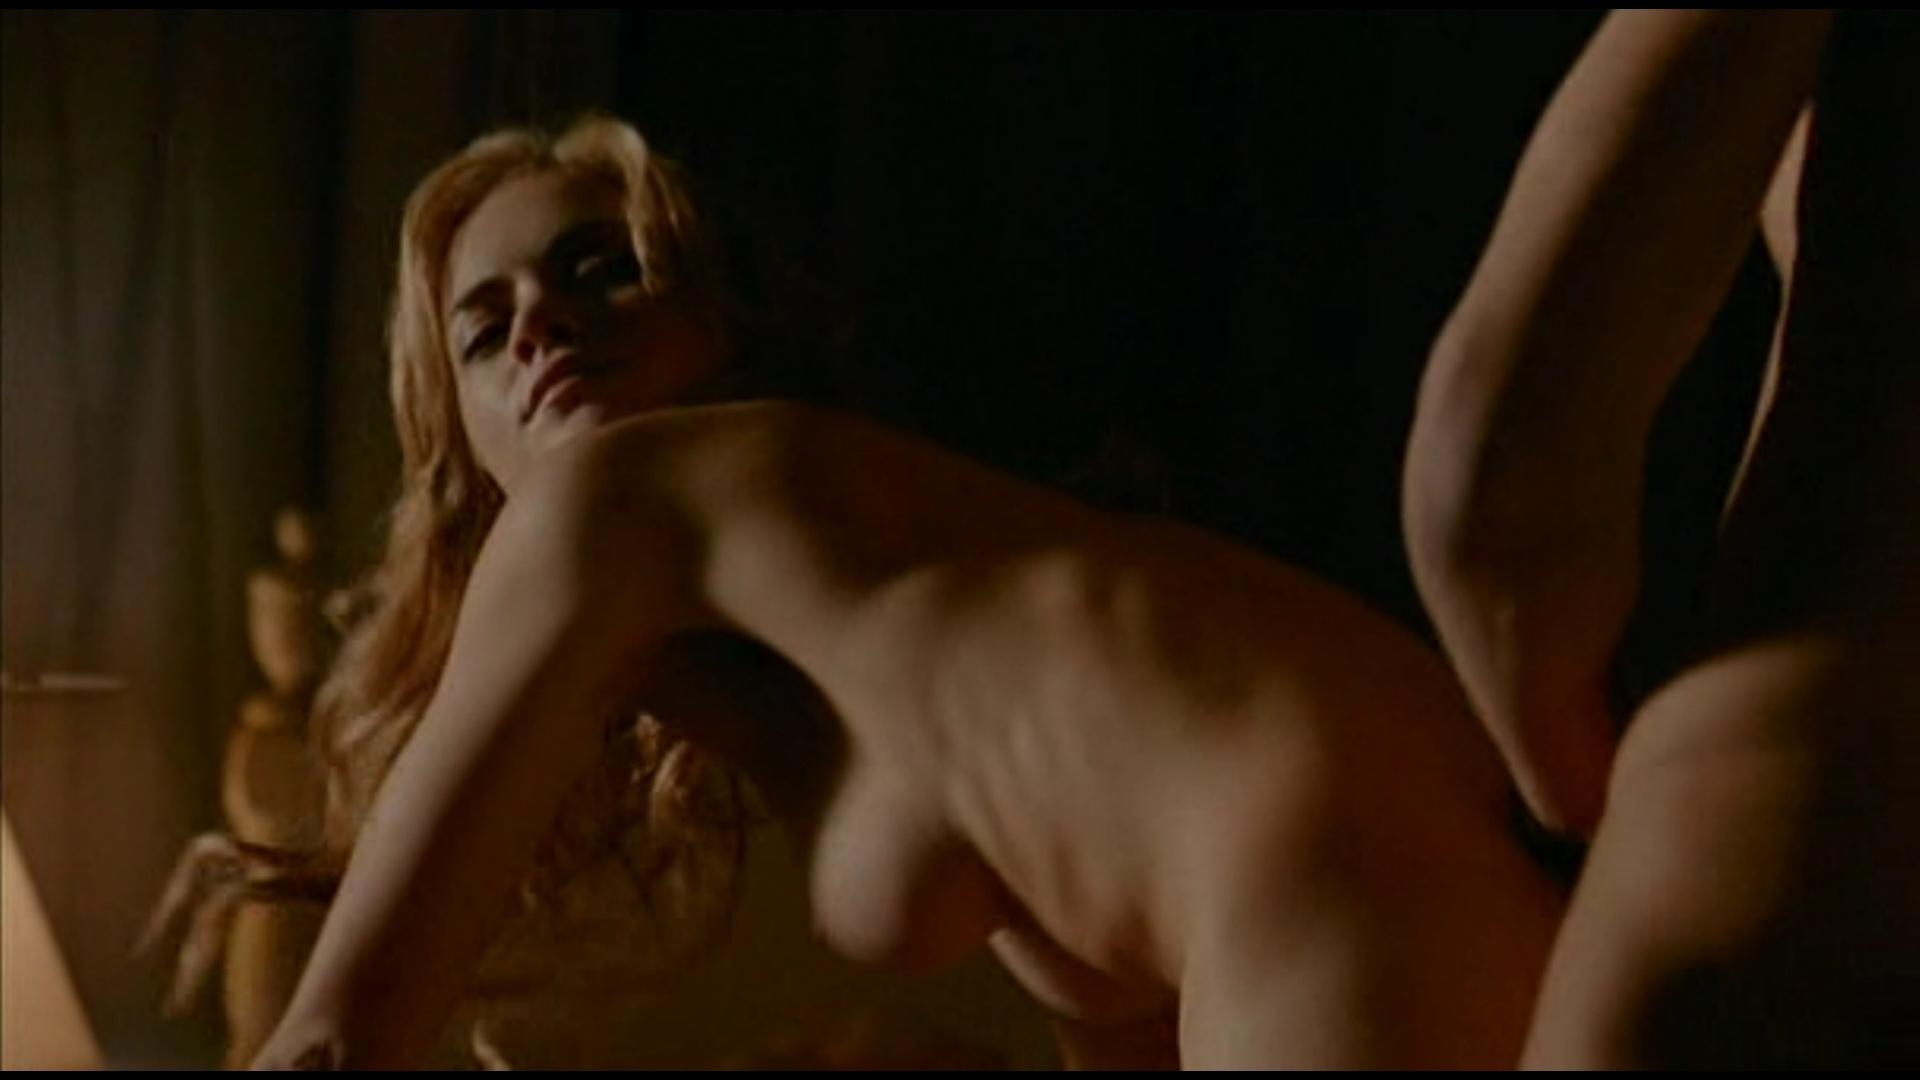 hot naked bikini girlsmaking out